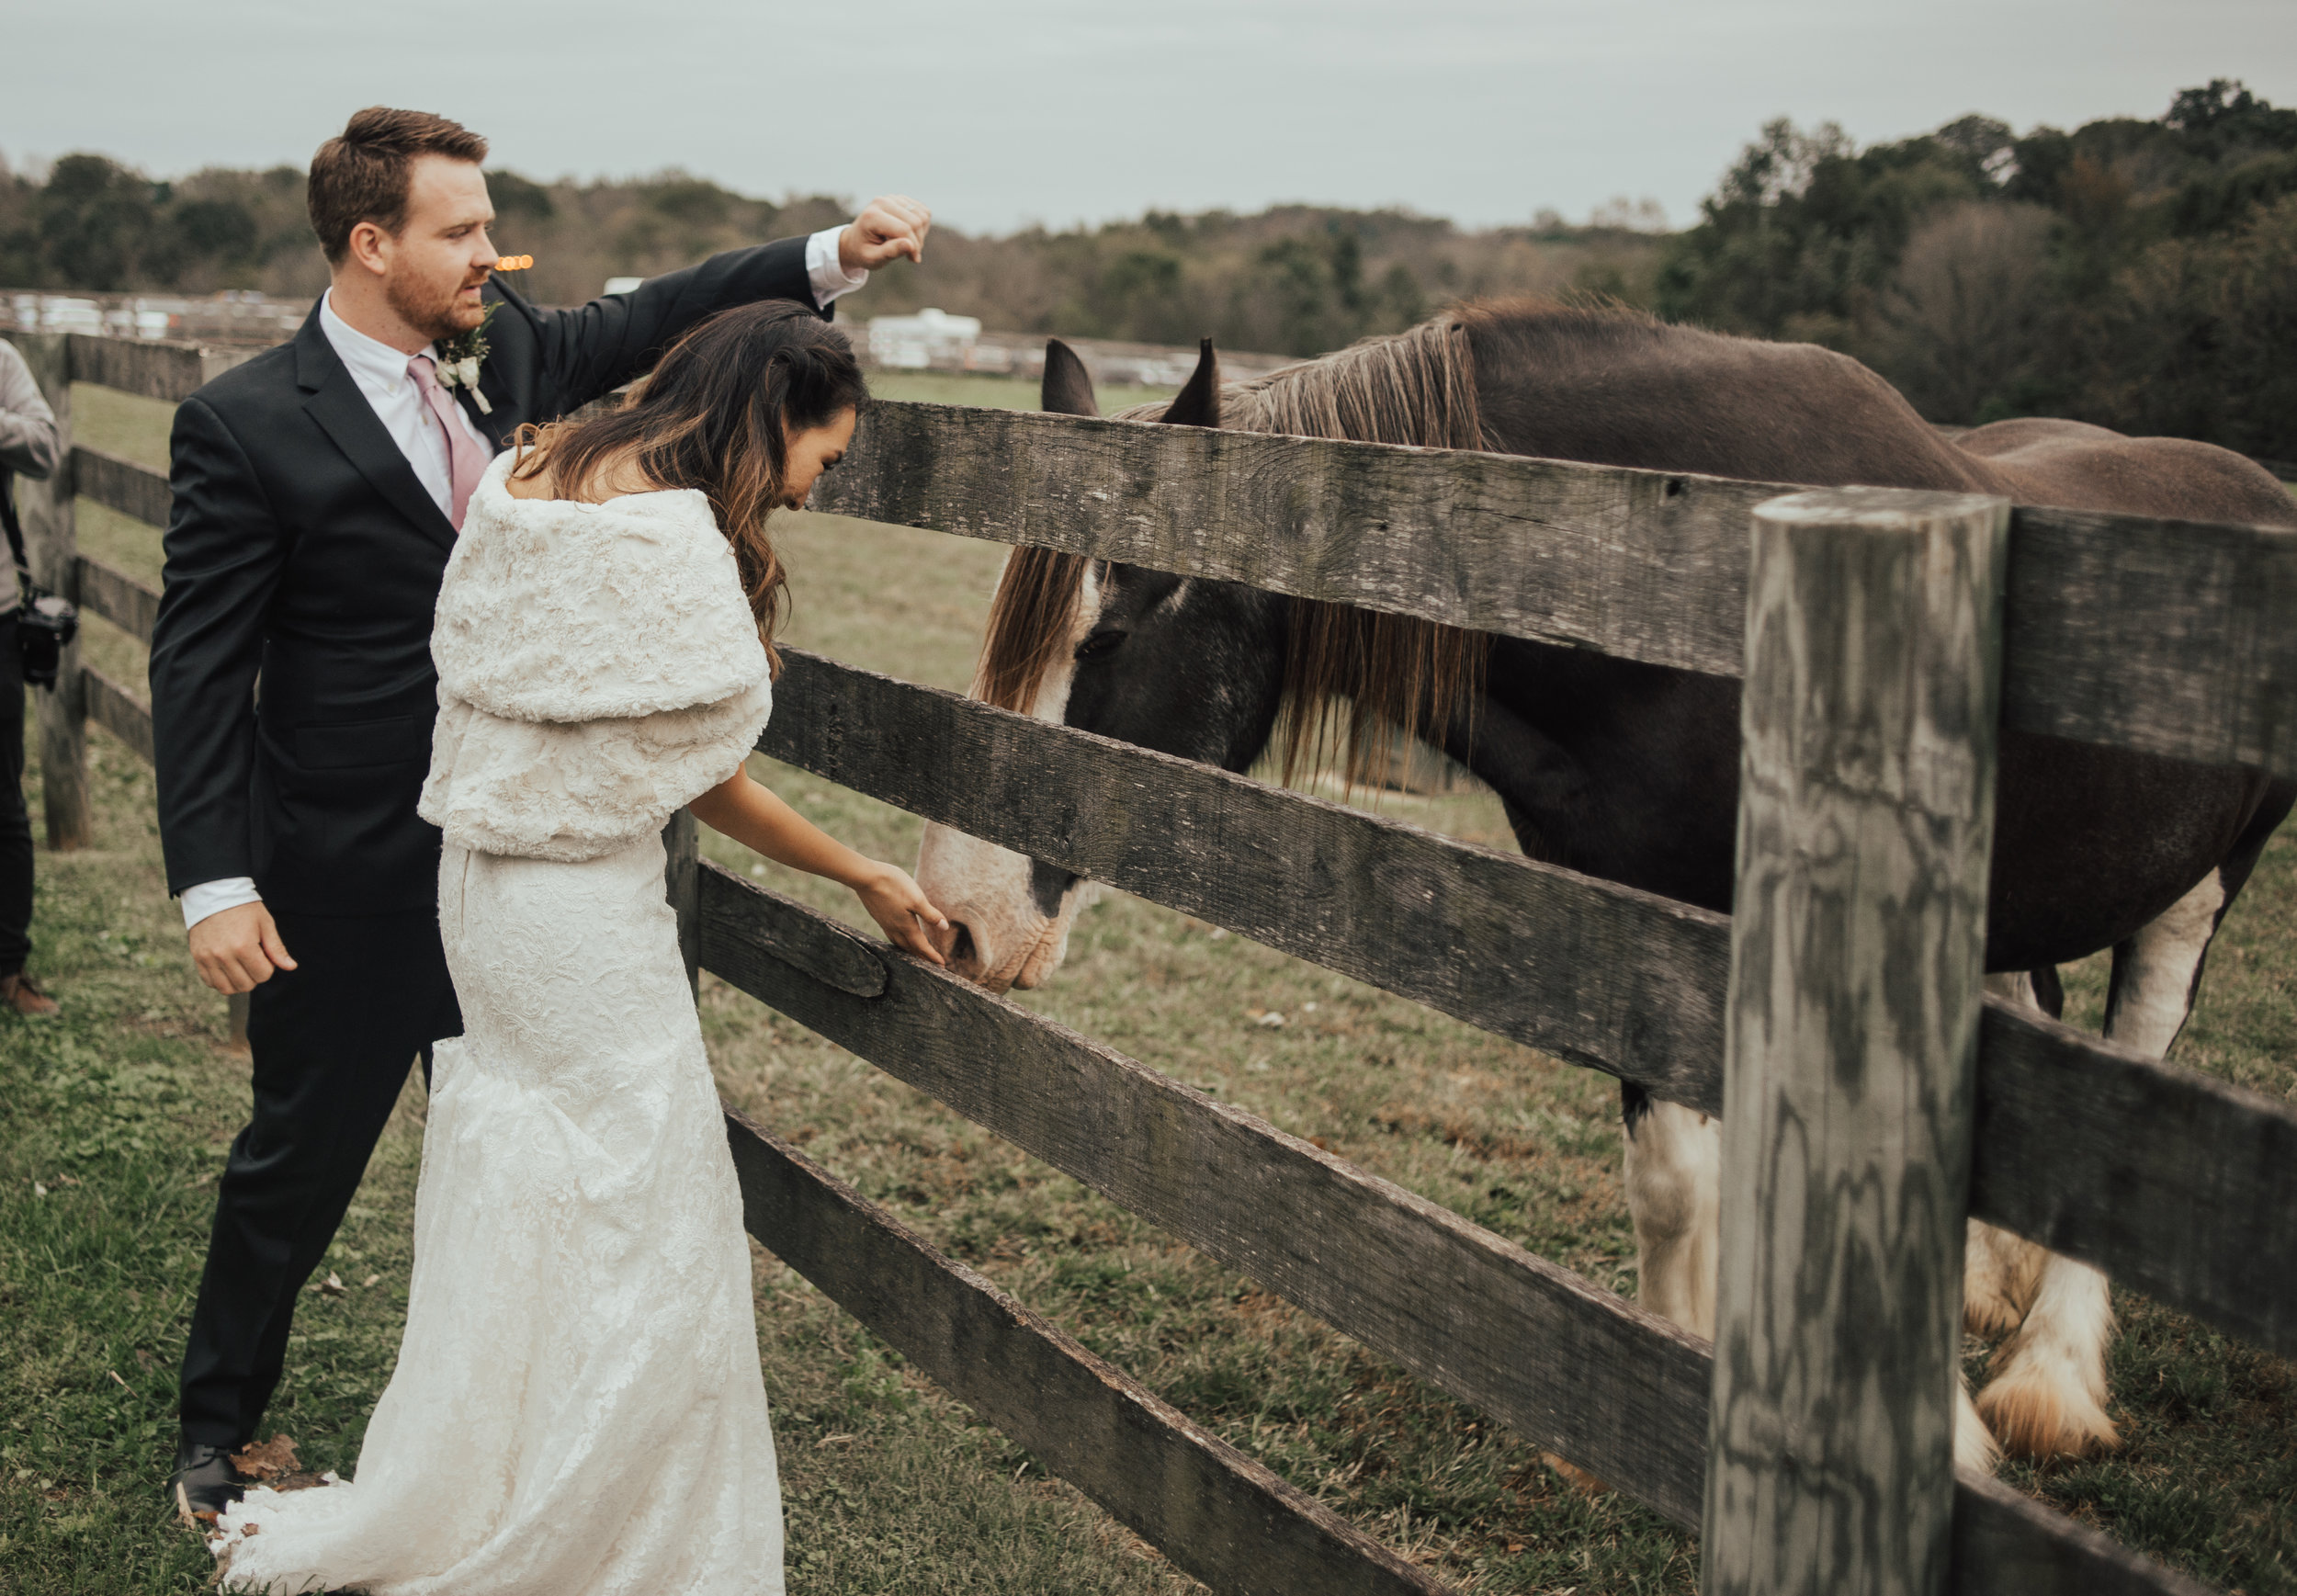 Sylvanside Farm Winter Wedding By SB Photographs246246246246024624624624624624624624624629529529524600246246246246.jpg